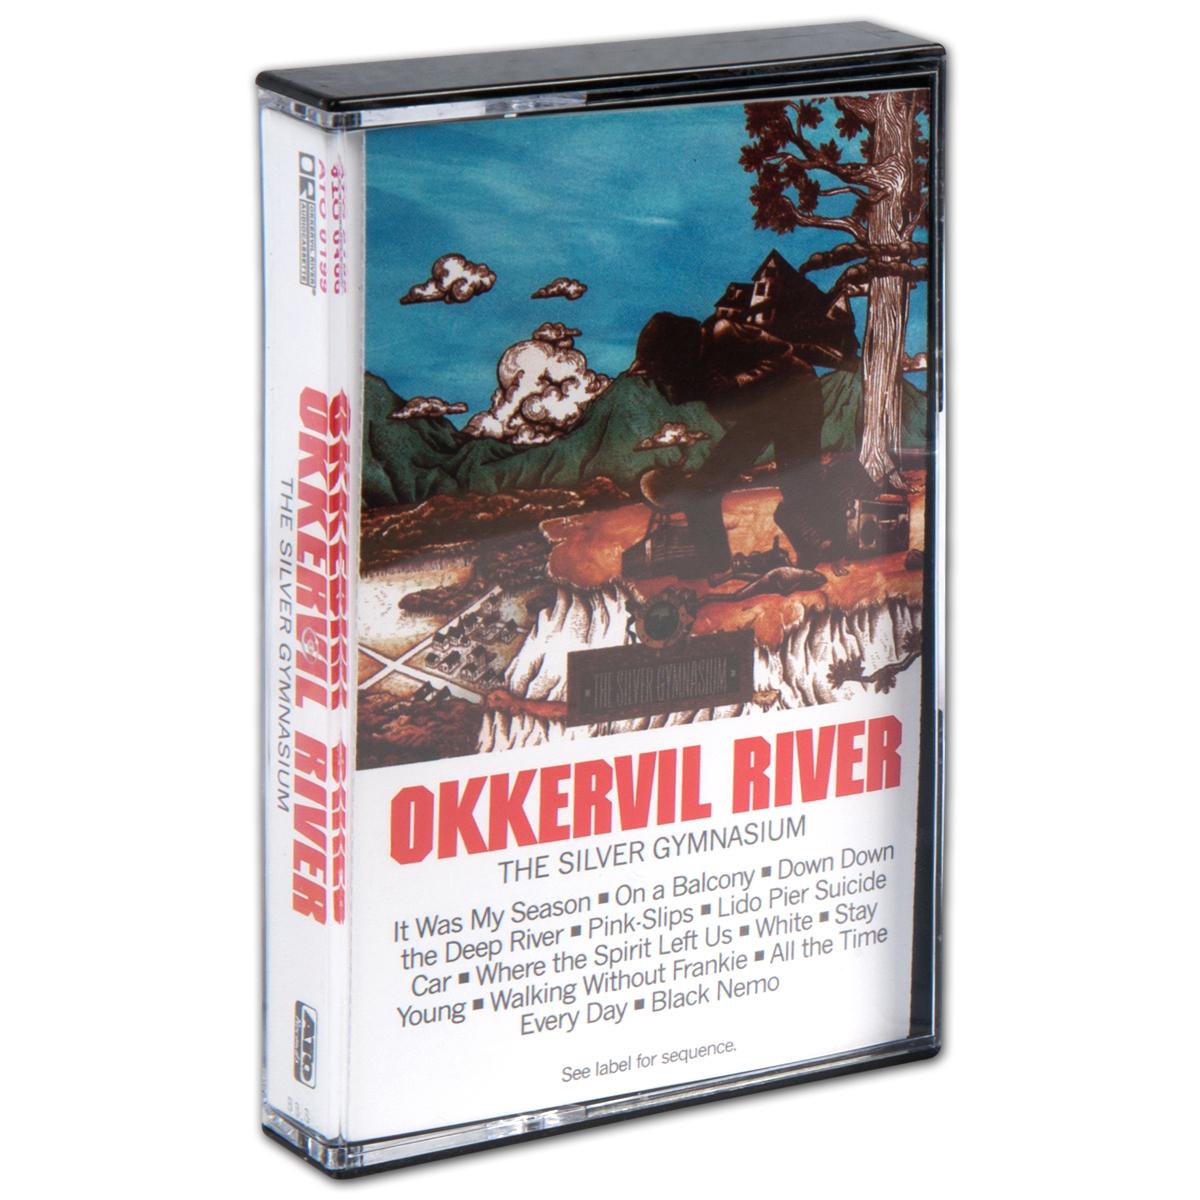 Okkervil River - The Silver Gymnasium Cassette